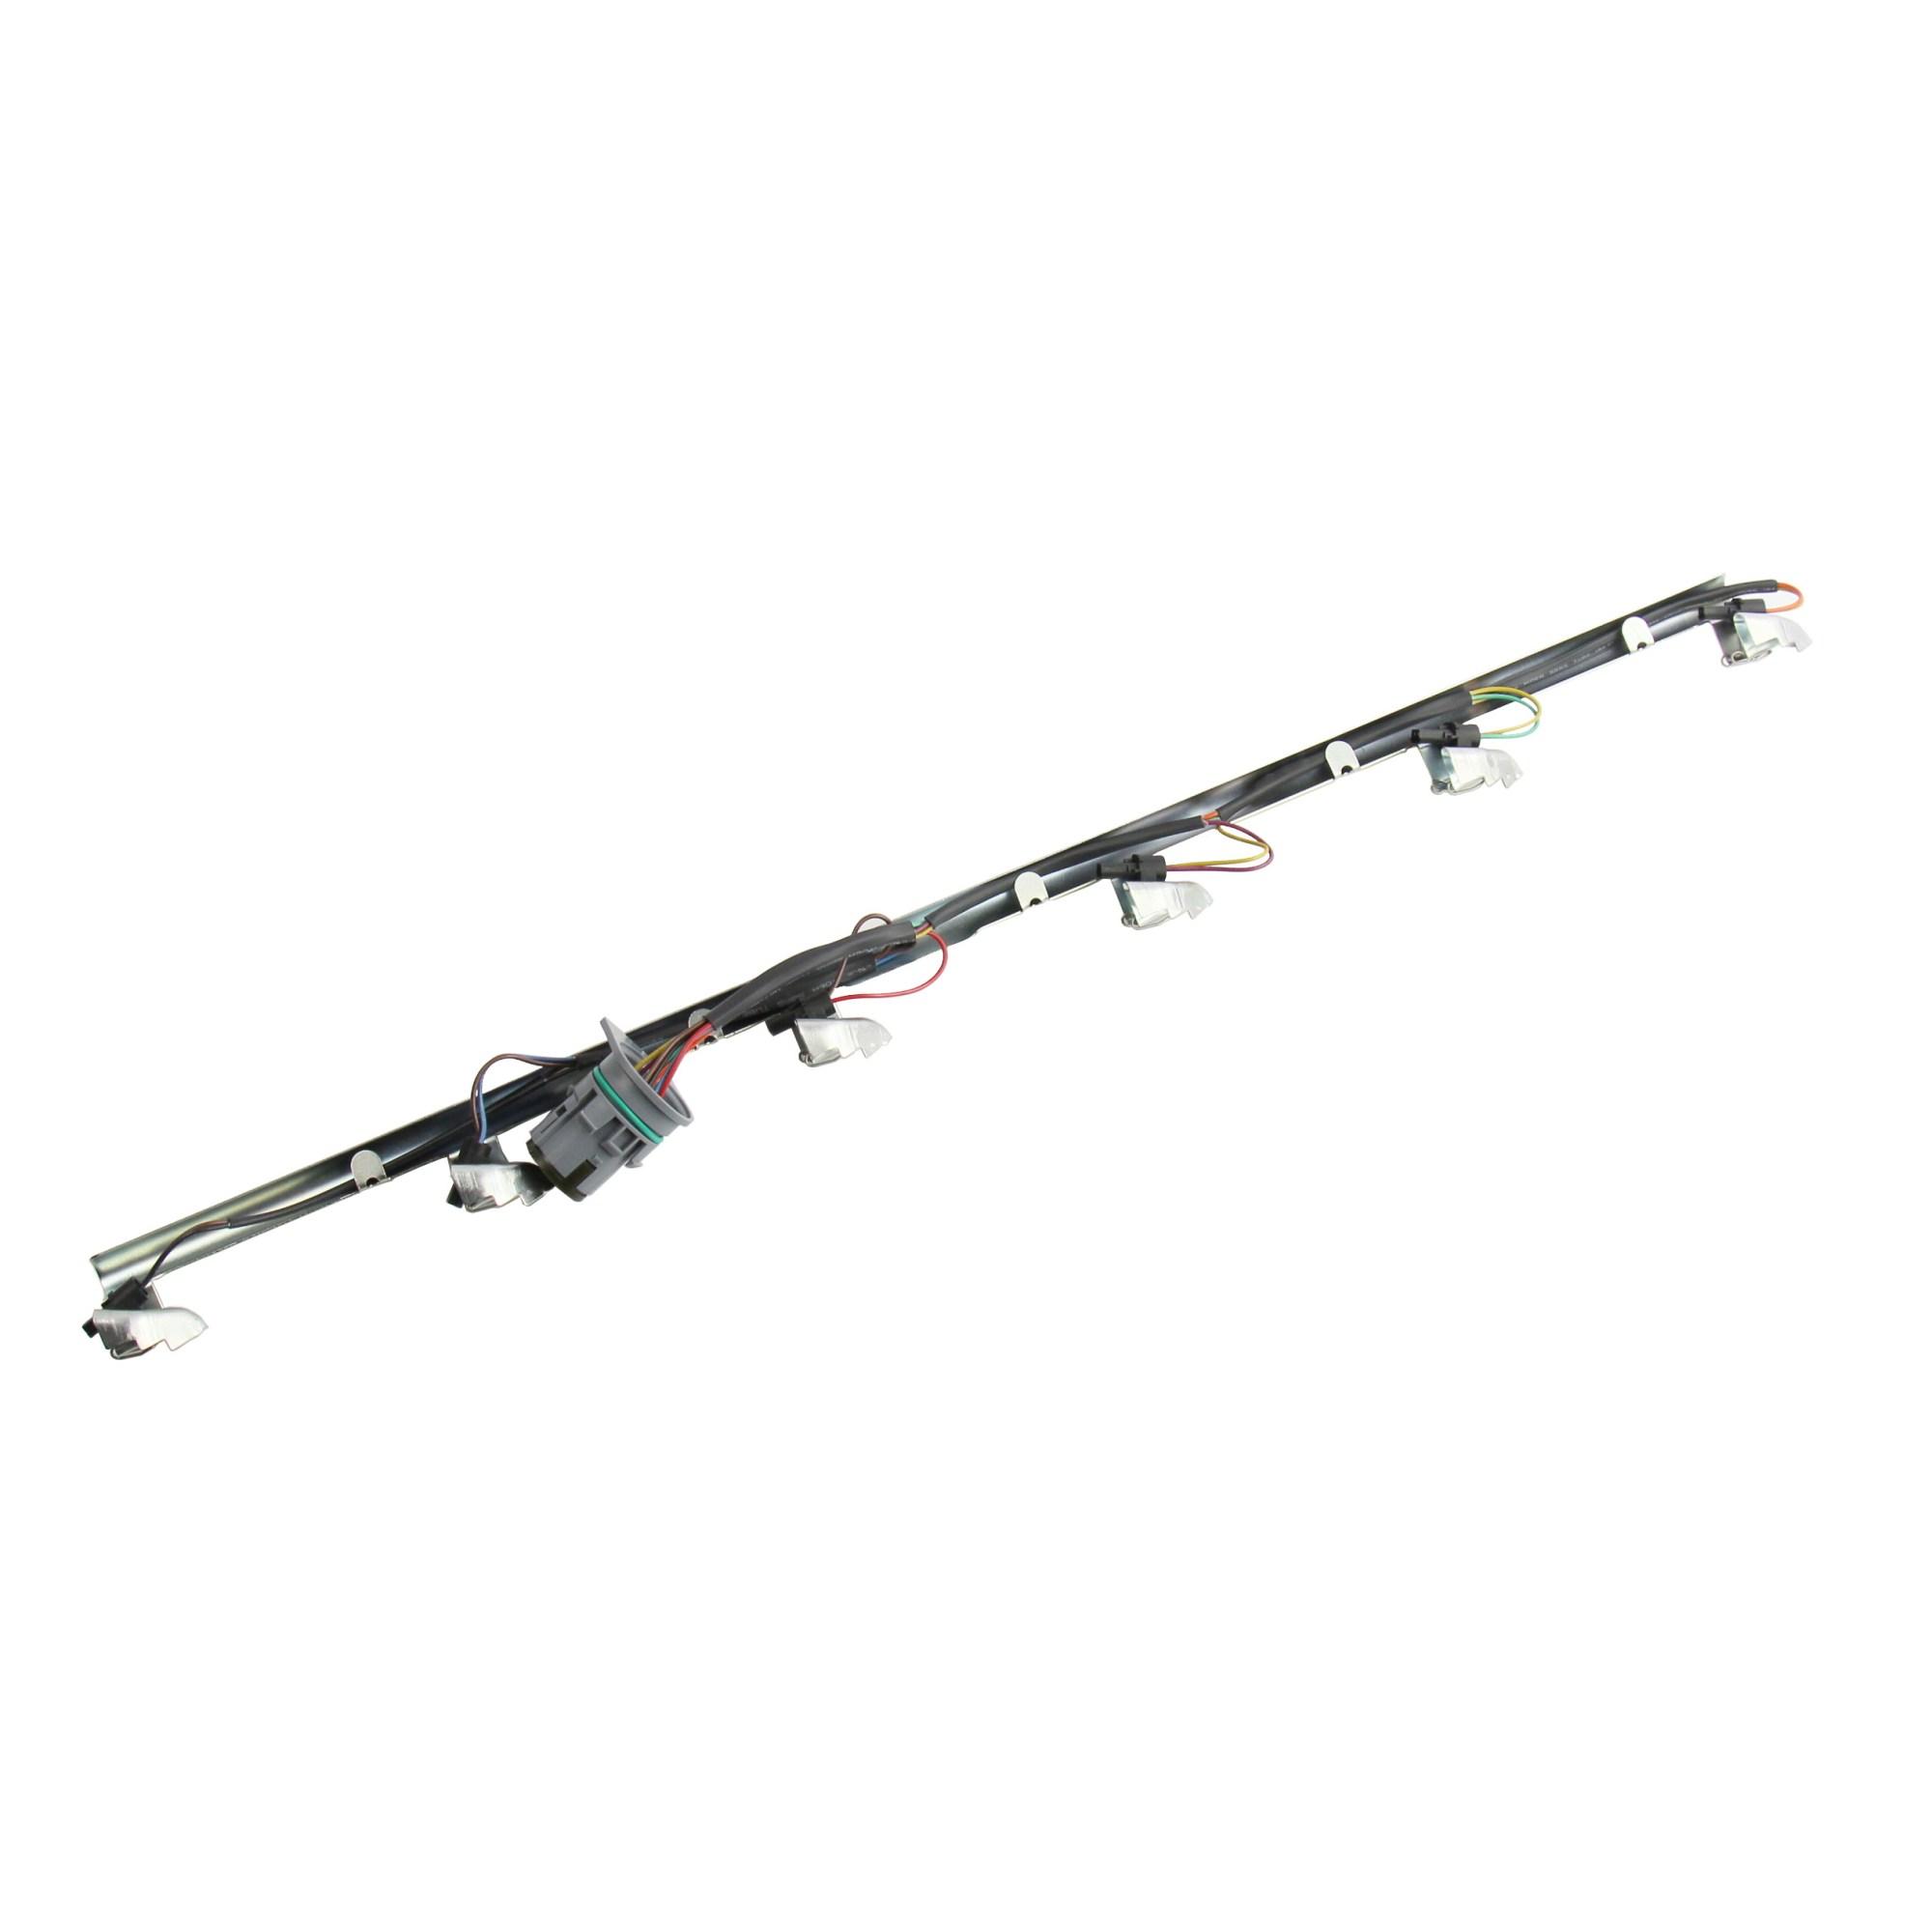 hight resolution of new injector harness for navistar international dt466 dt530 dt466e 1889905c92